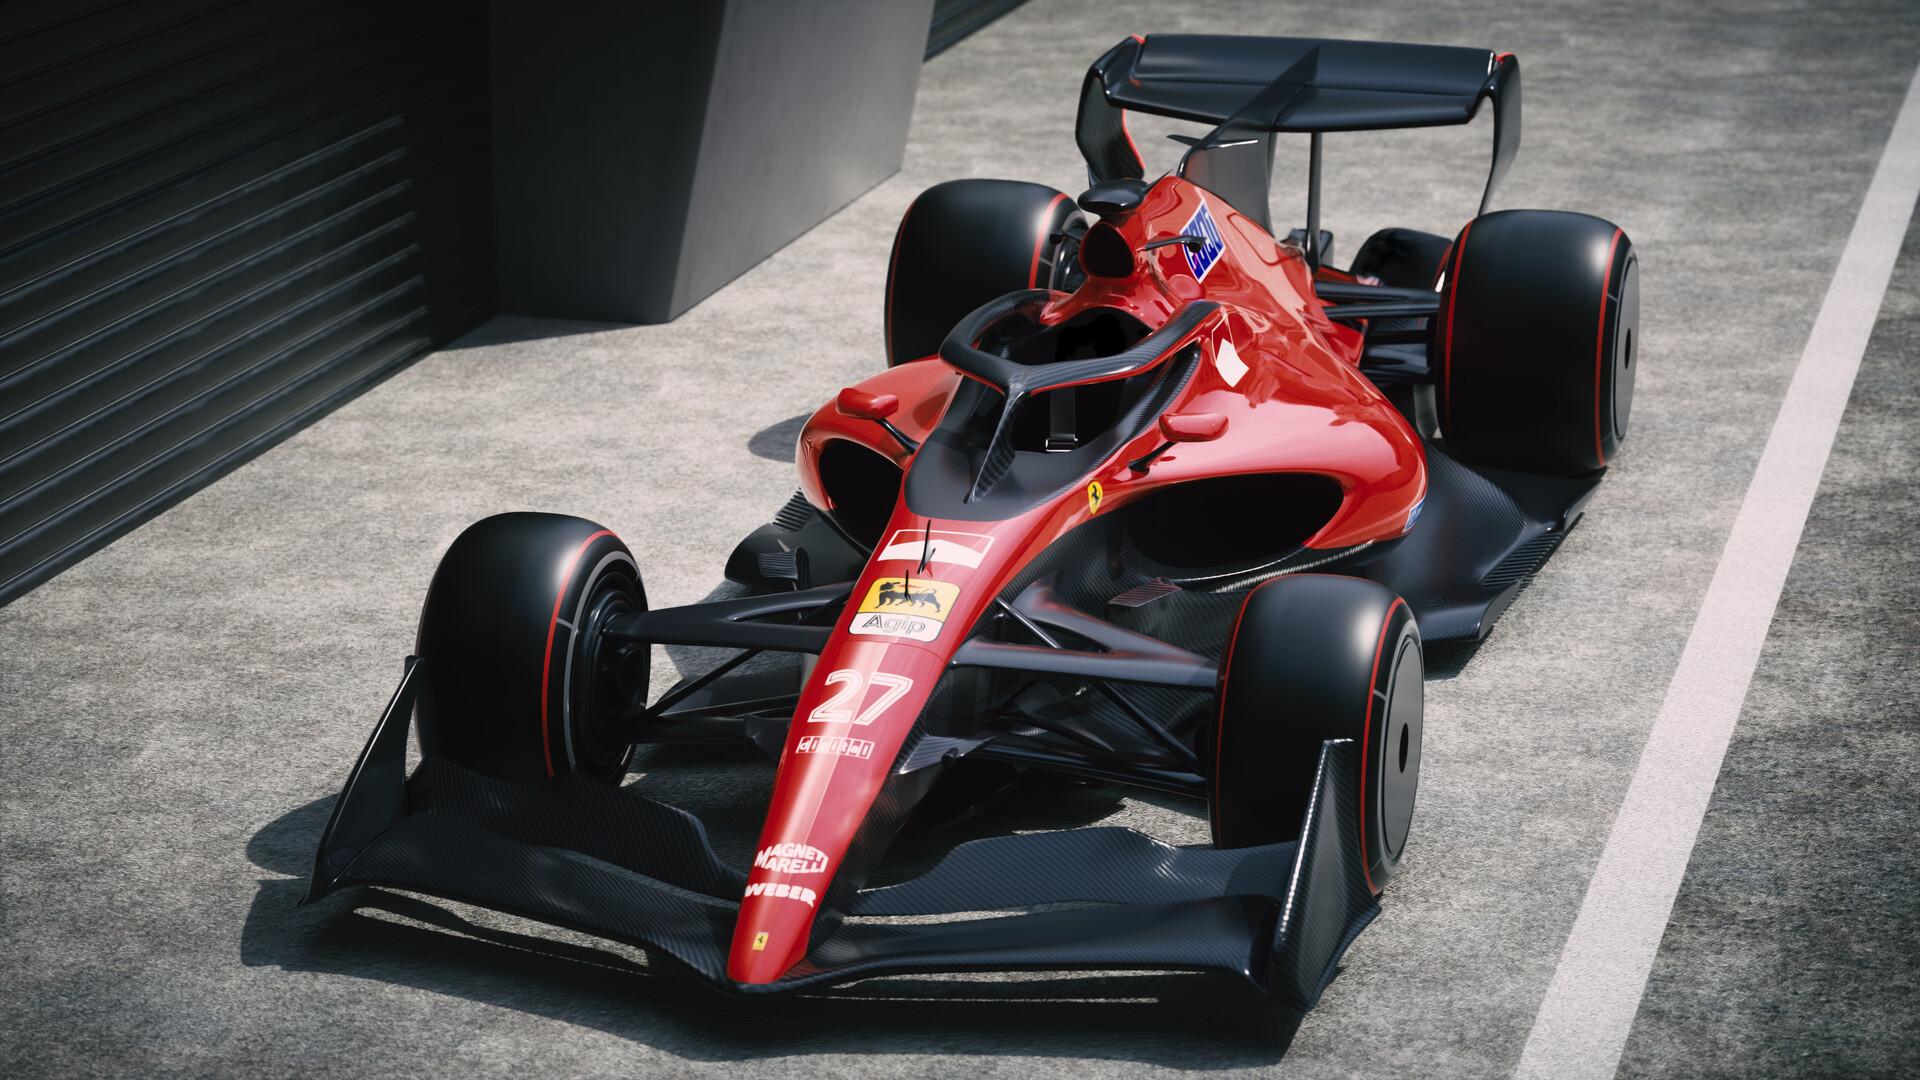 Formula F1 2021 Ferrari   1920x1080 Wallpaper   teahubio 1920x1080